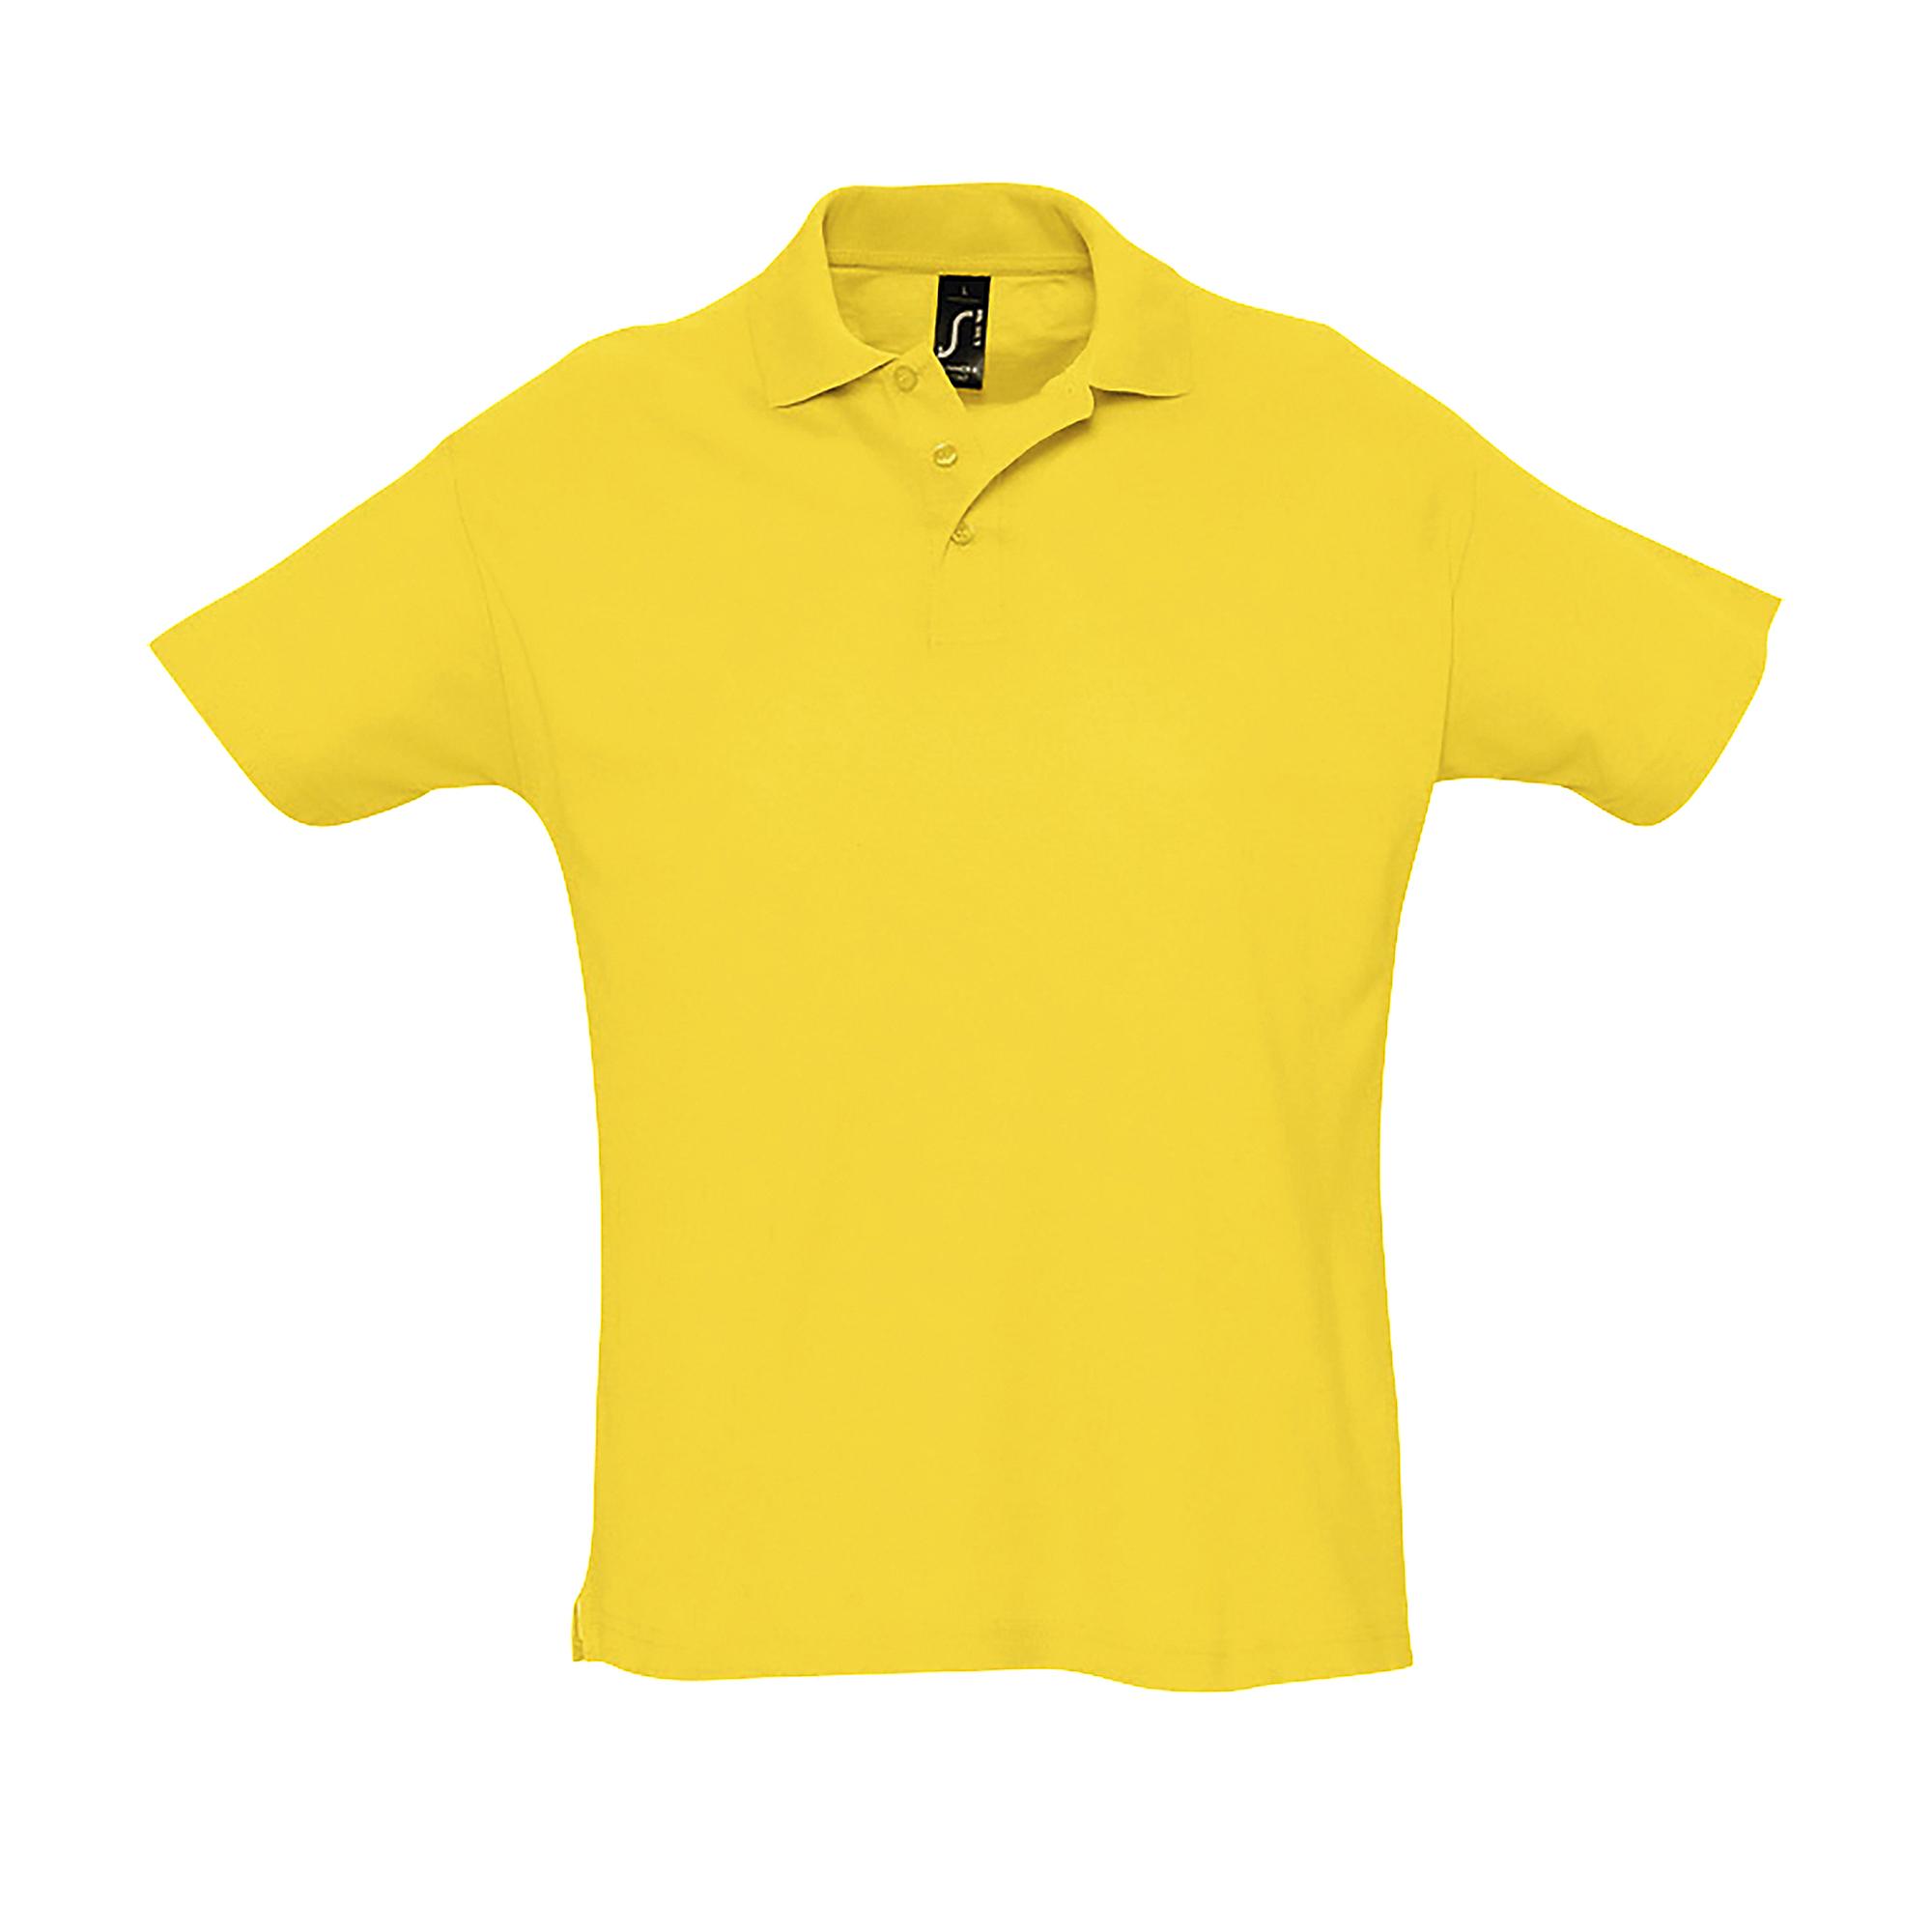 SOLS-Mens-Summer-II-Pique-Short-Sleeve-Casual-Plain-Polo-Shirt-T-Shirt-PC318 thumbnail 74